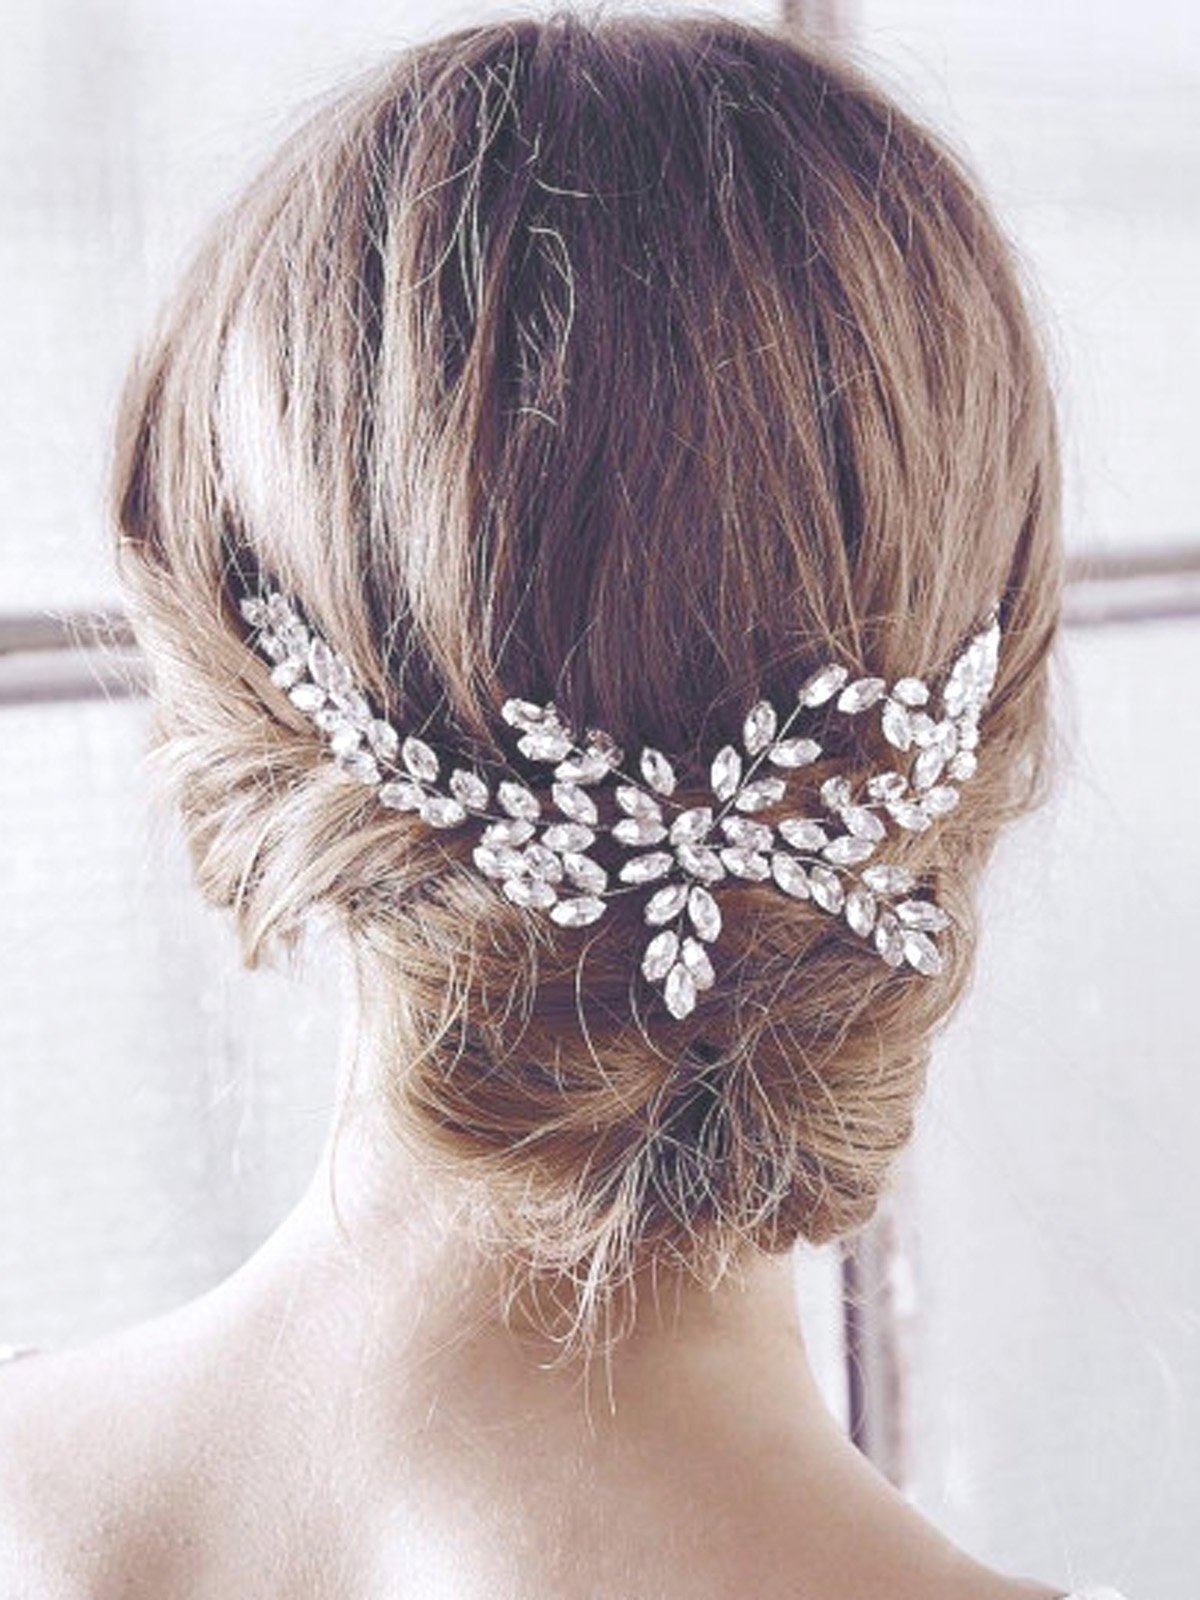 Yean Wedding Hair Comb Rhinestones Bridal Hair Side Comb Accessories Headdress for Bride and Bridesmaid (Silver)